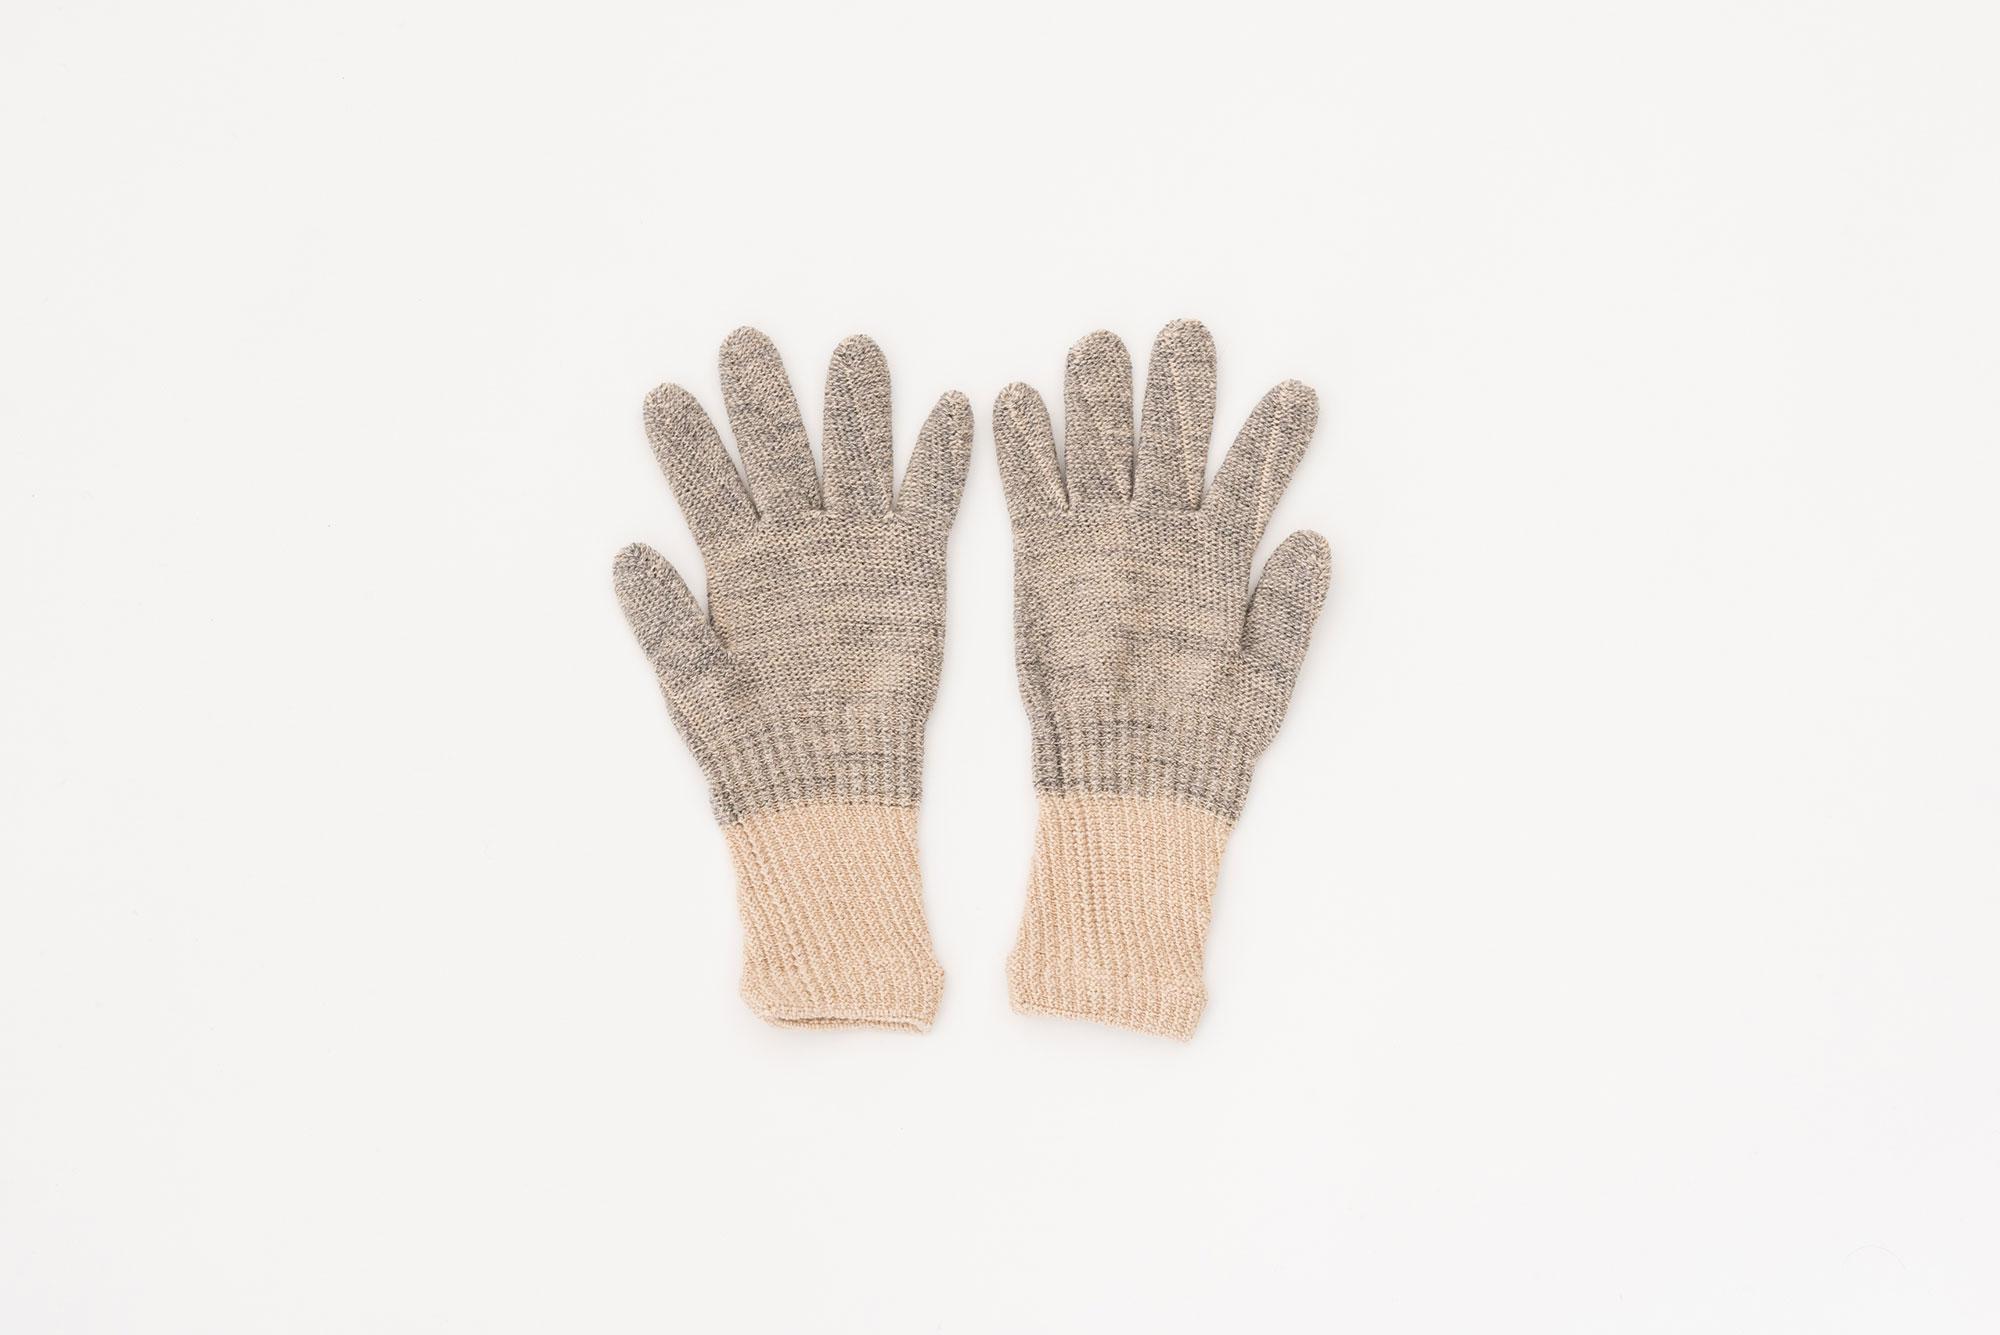 Glück und Gute オーガニックコットンとウールの手袋 For Women 指短め